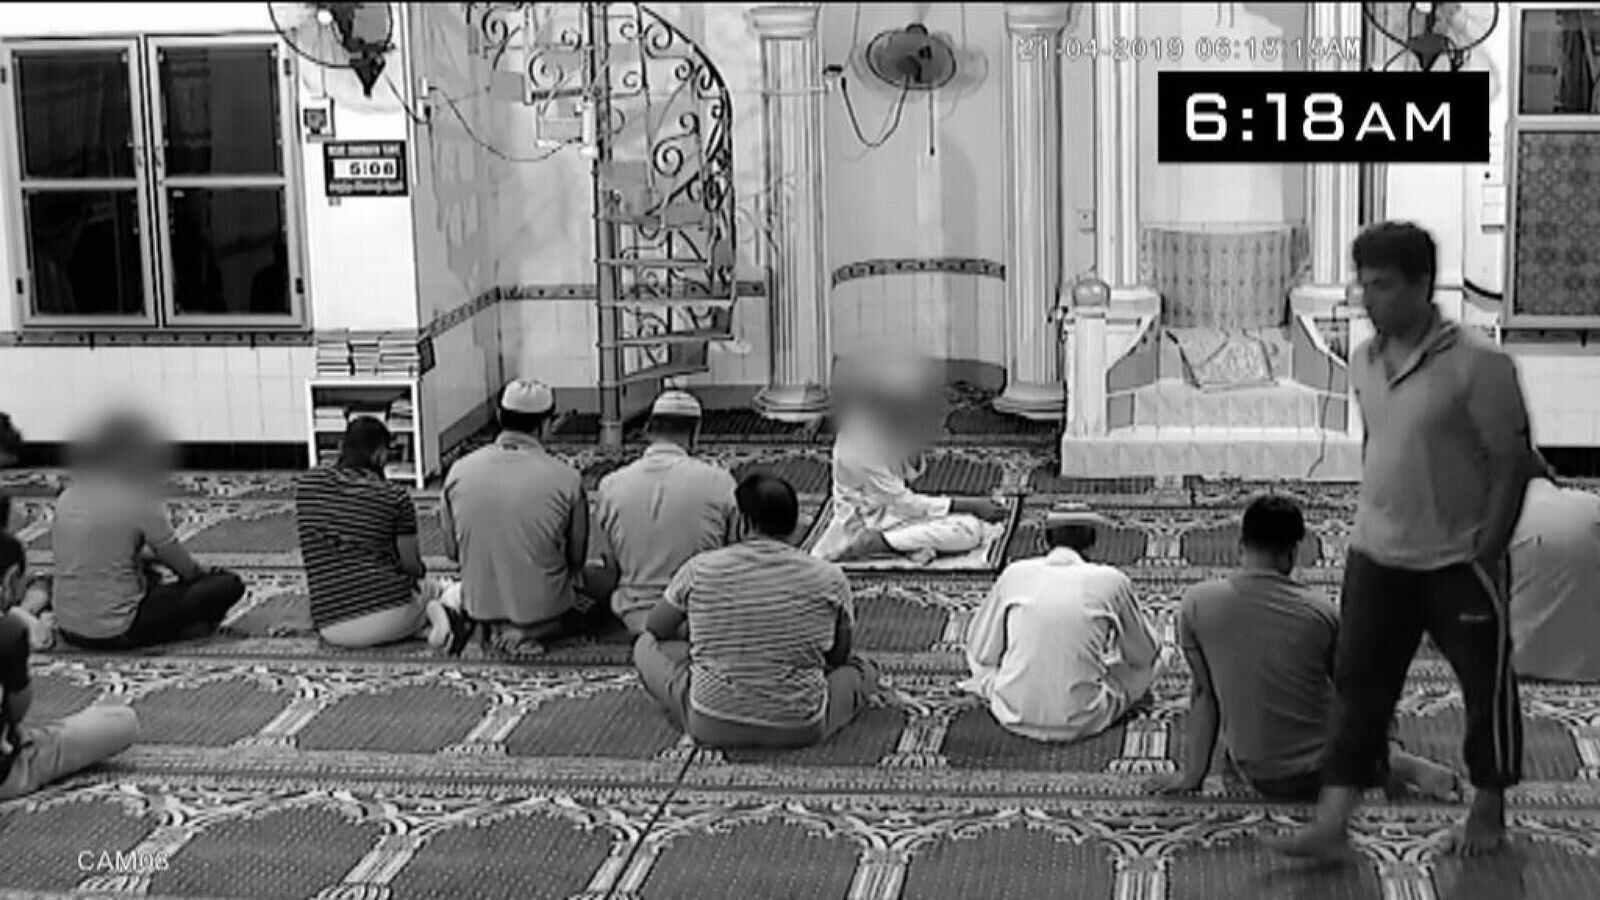 Mohammed-azar_1-d_12150